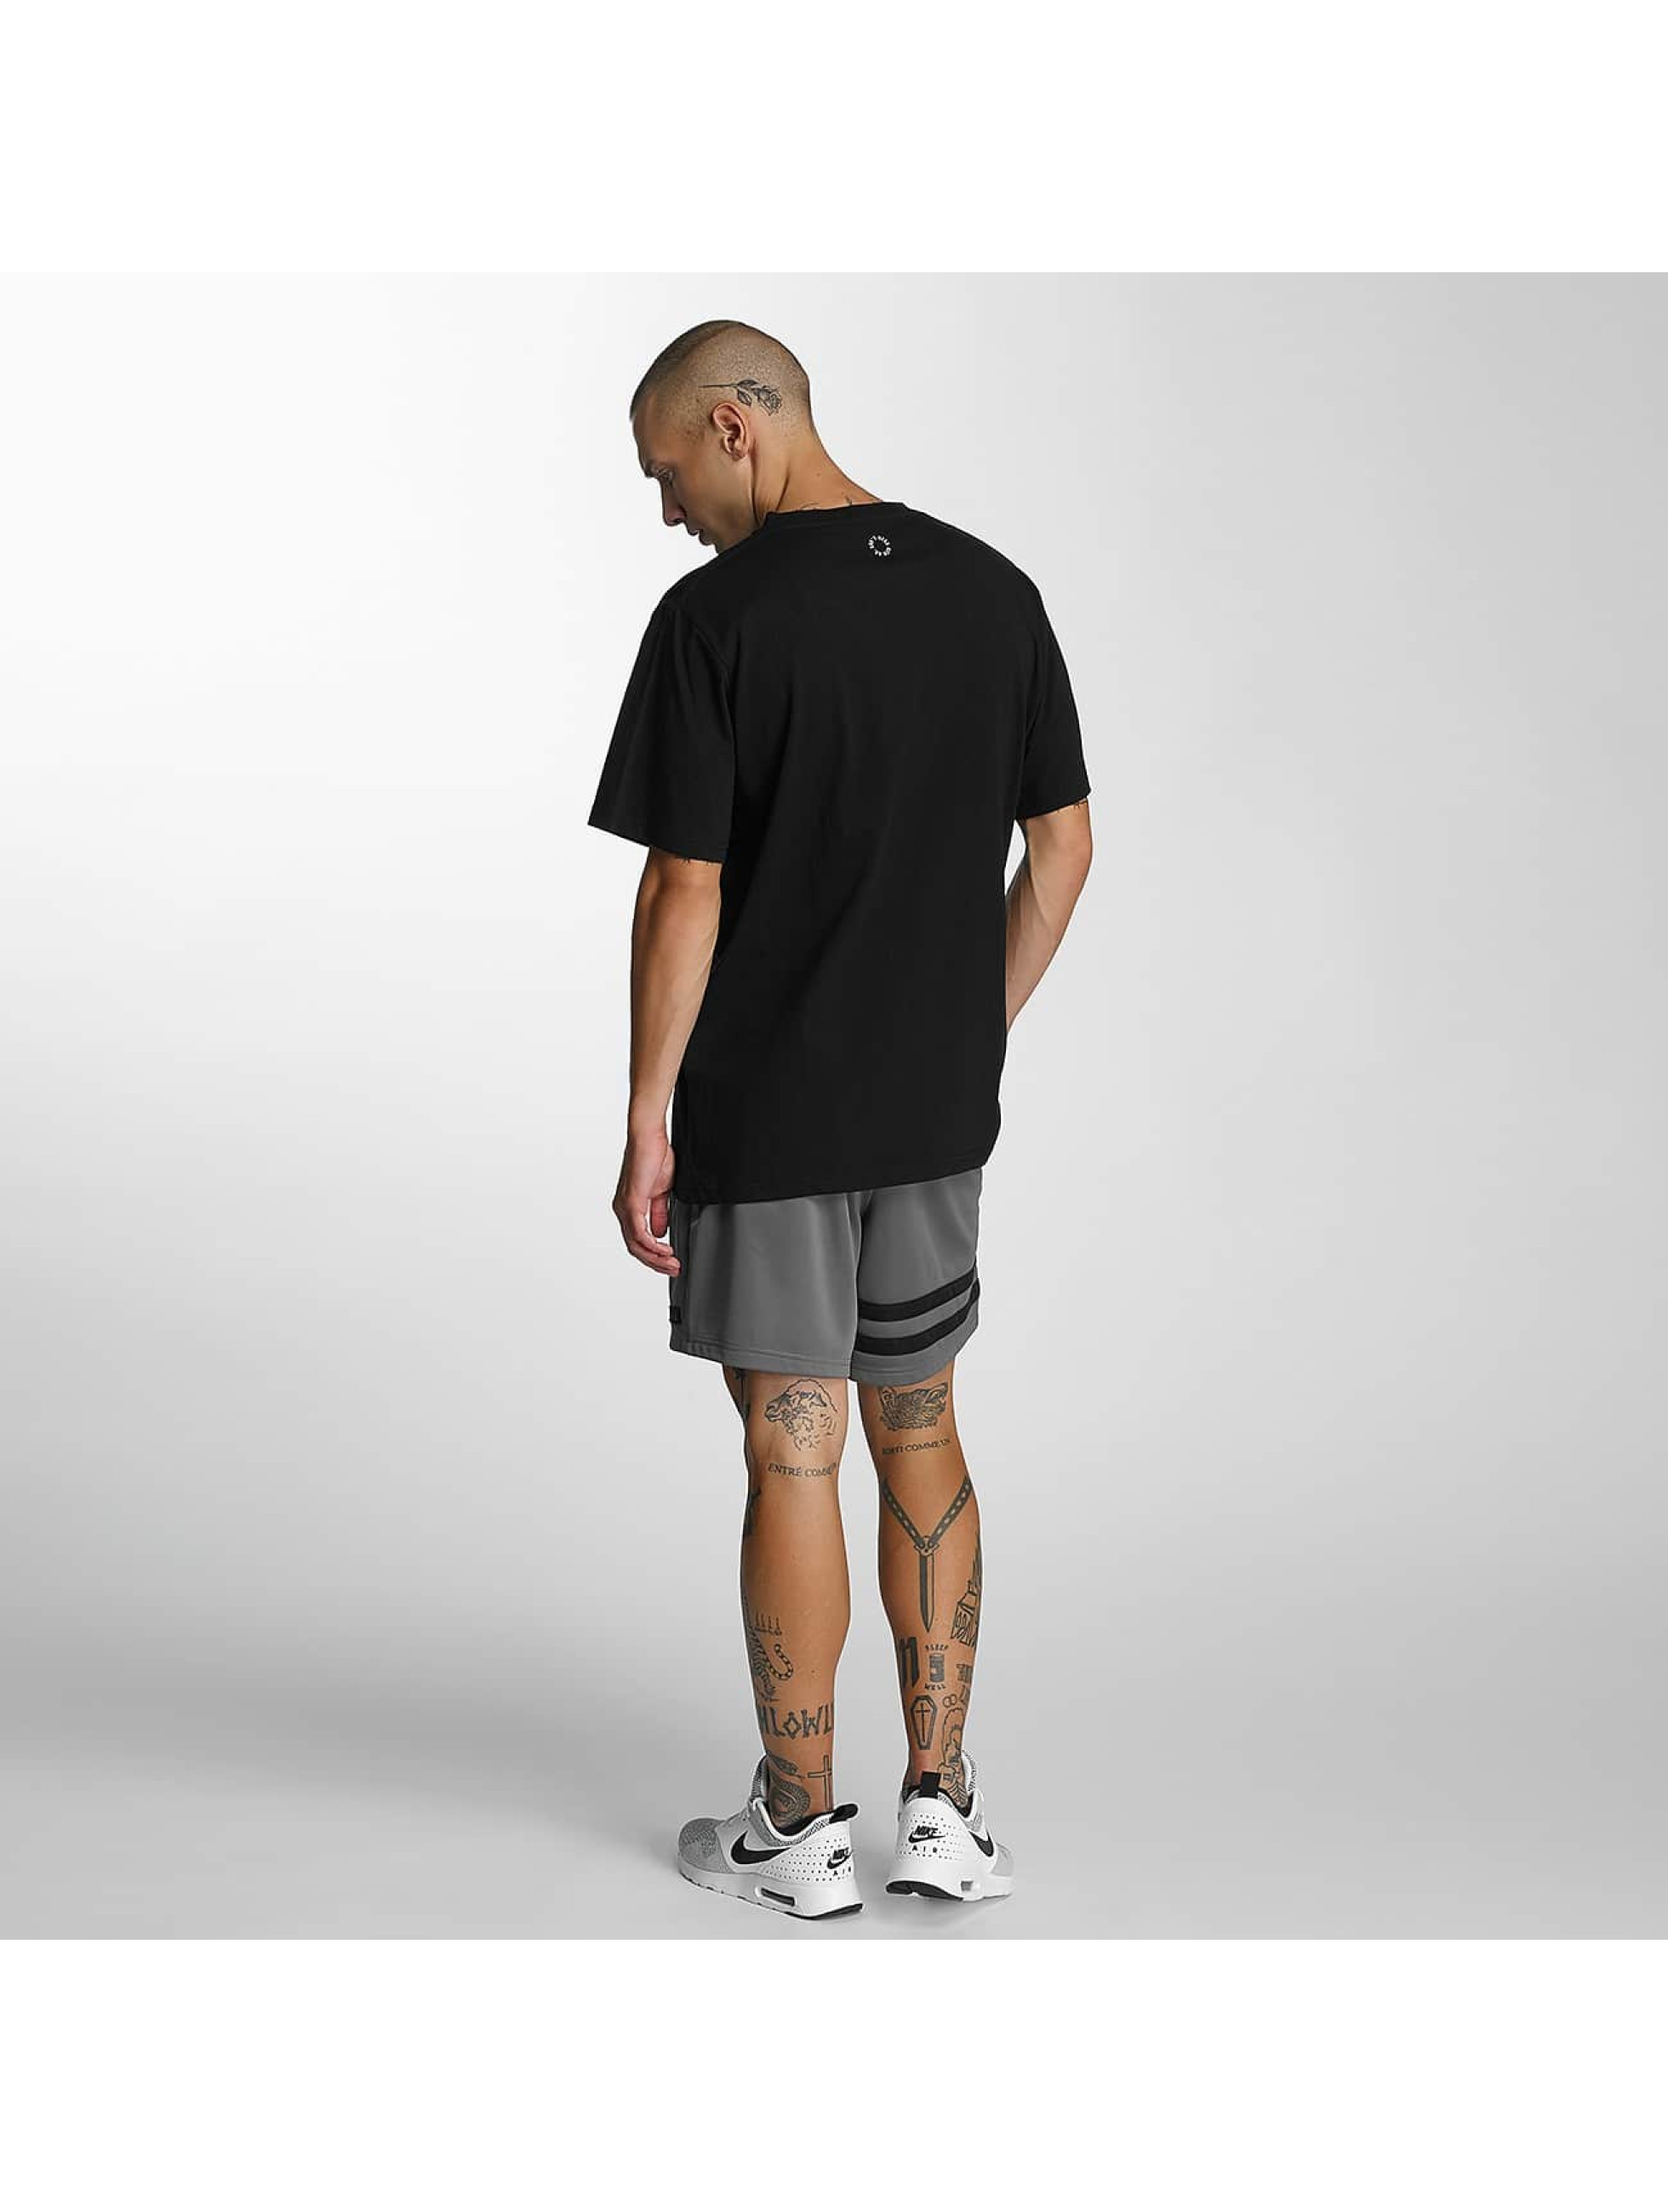 UNFAIR ATHLETICS T-Shirt Statement black